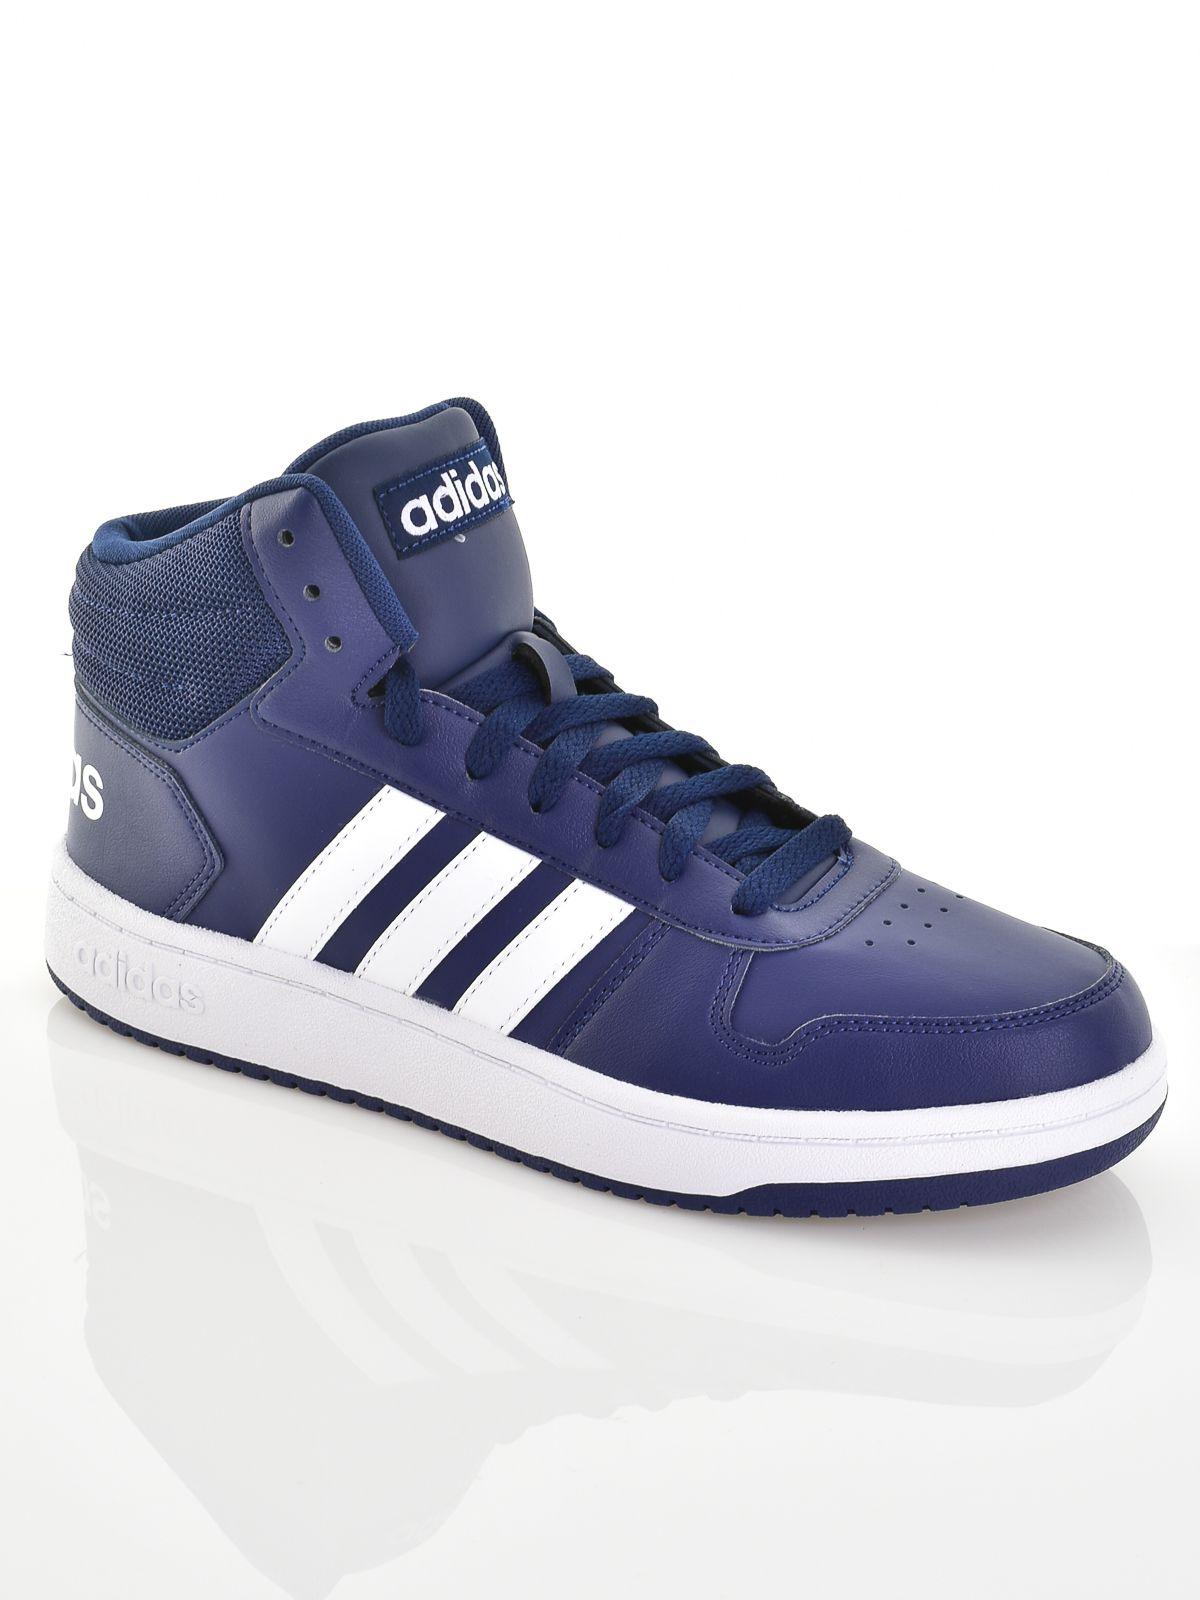 Adidas férfi magasszárú cipő HOOPS 2.0 MID | Markasbolt.hu